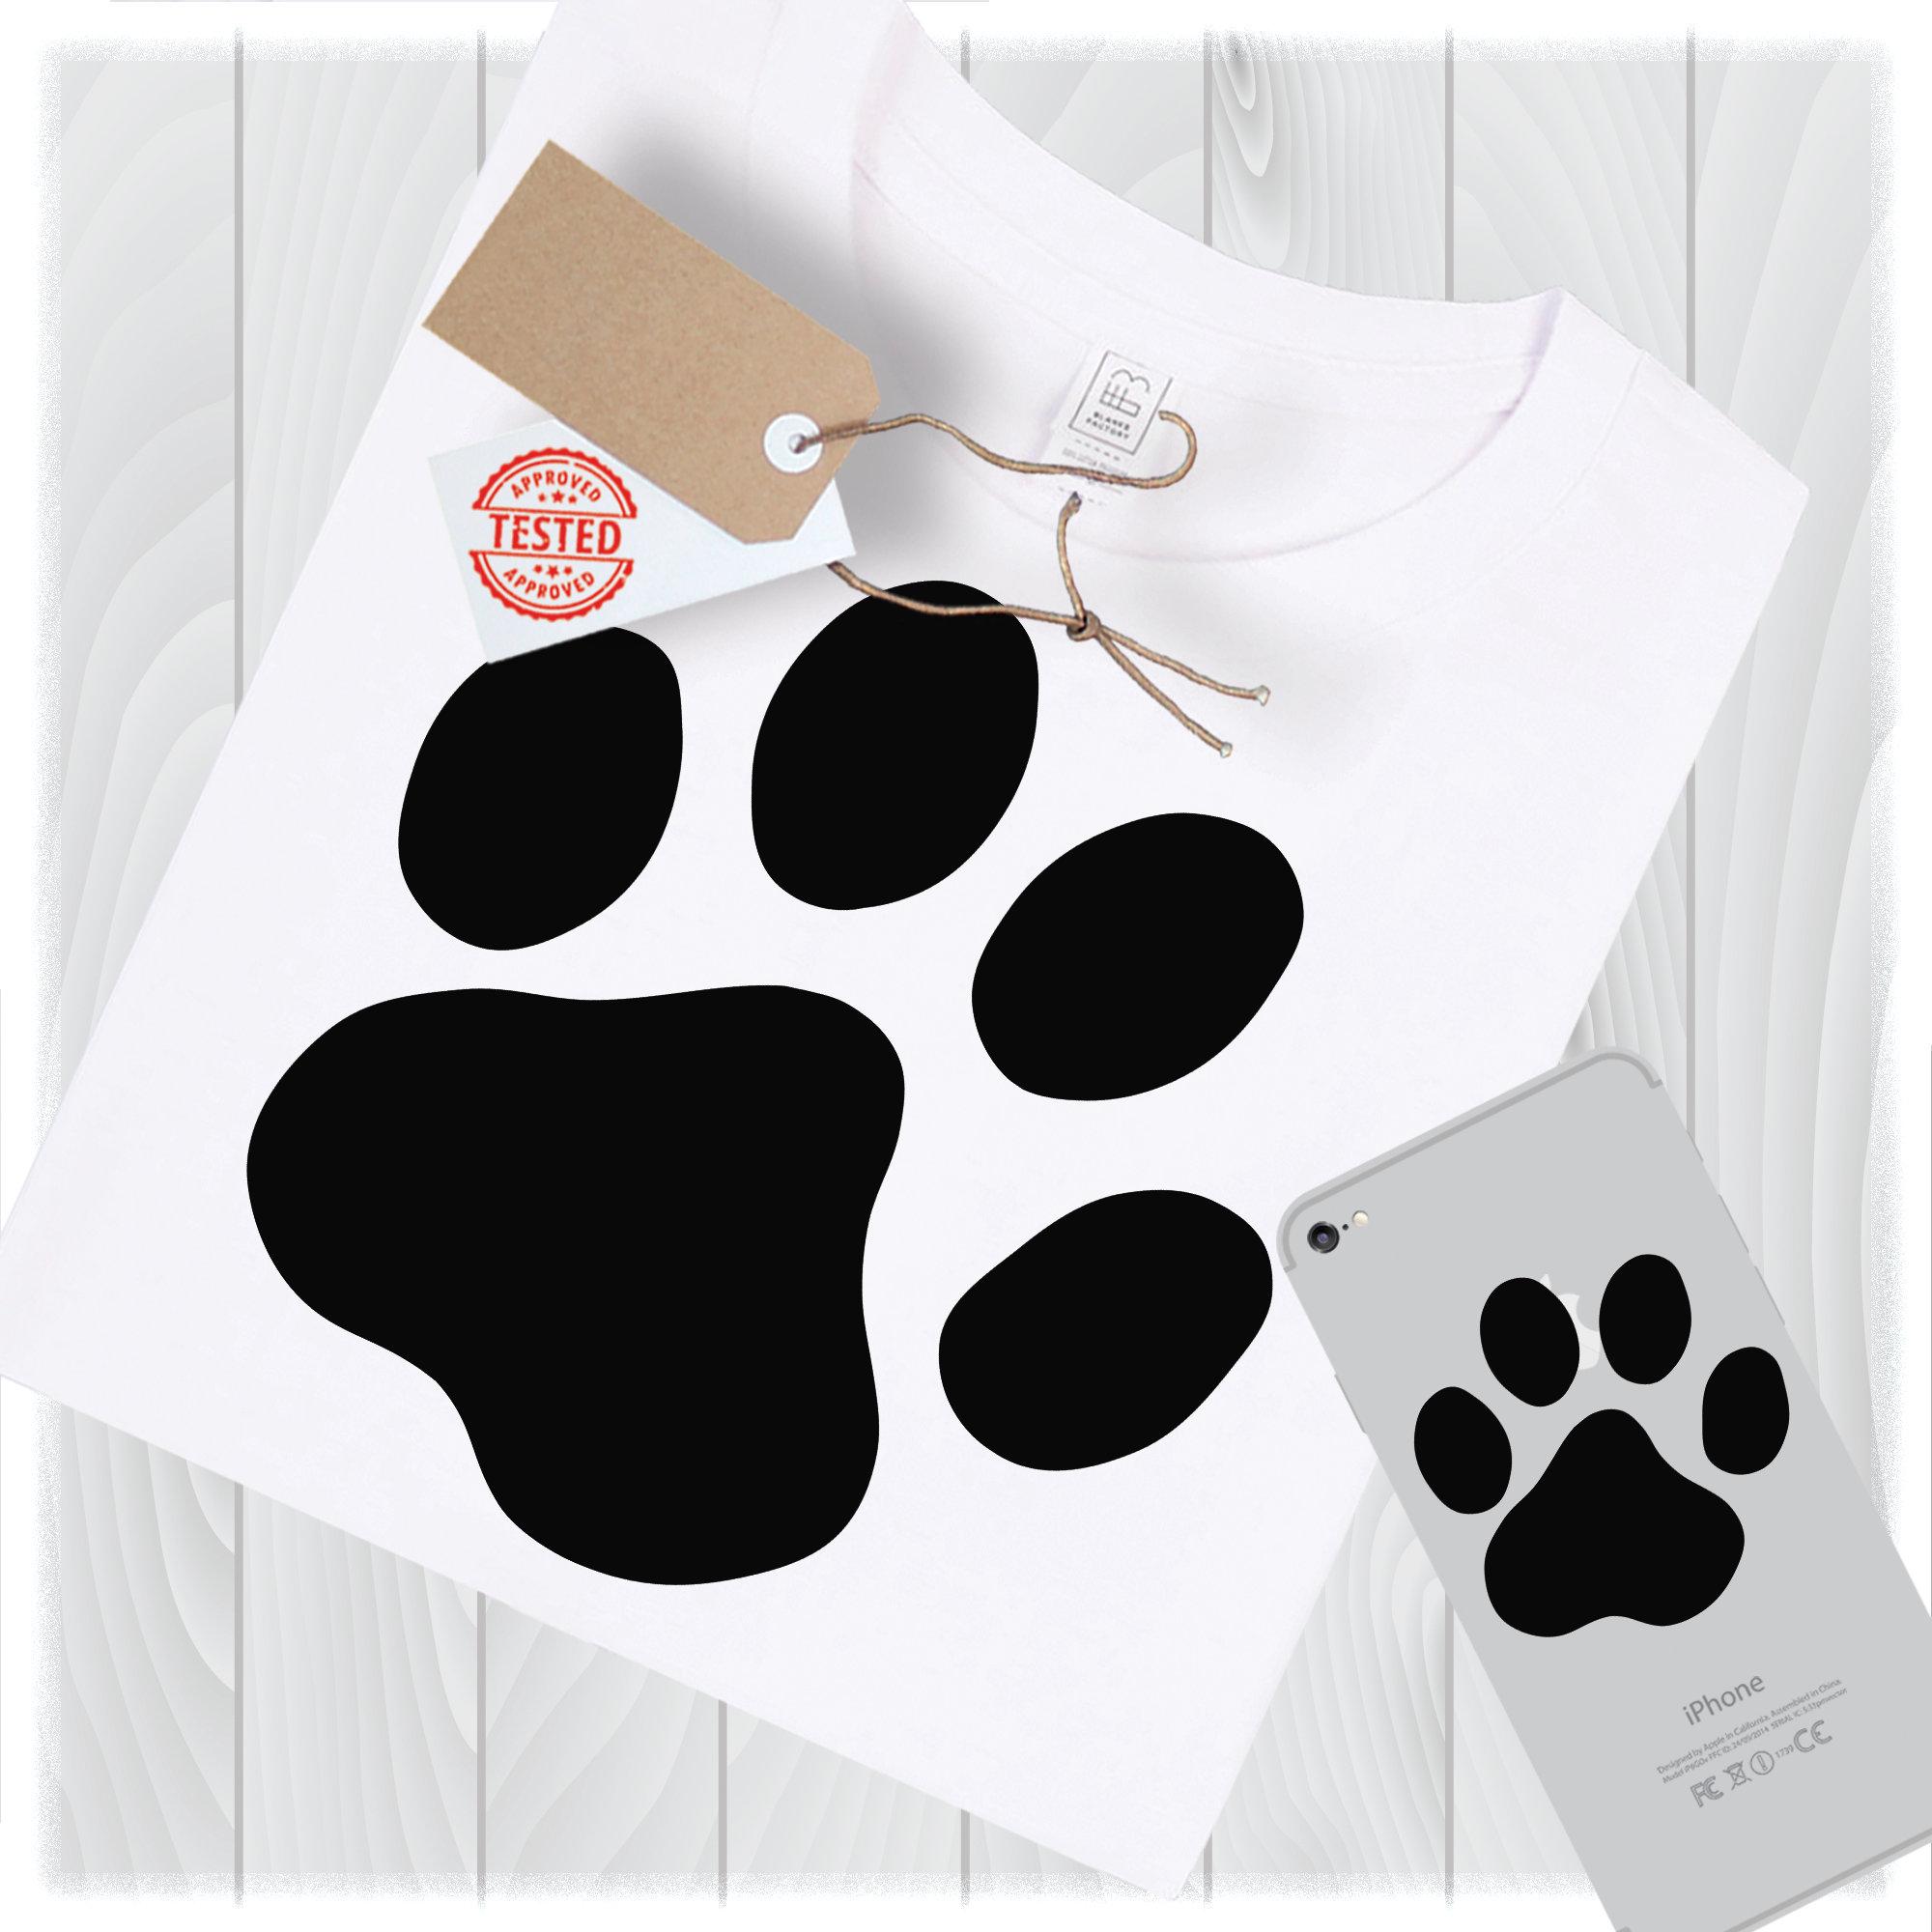 Download Dog Paw Print Svg Files for Cricut Designs Dog Svg Dog Paw ...